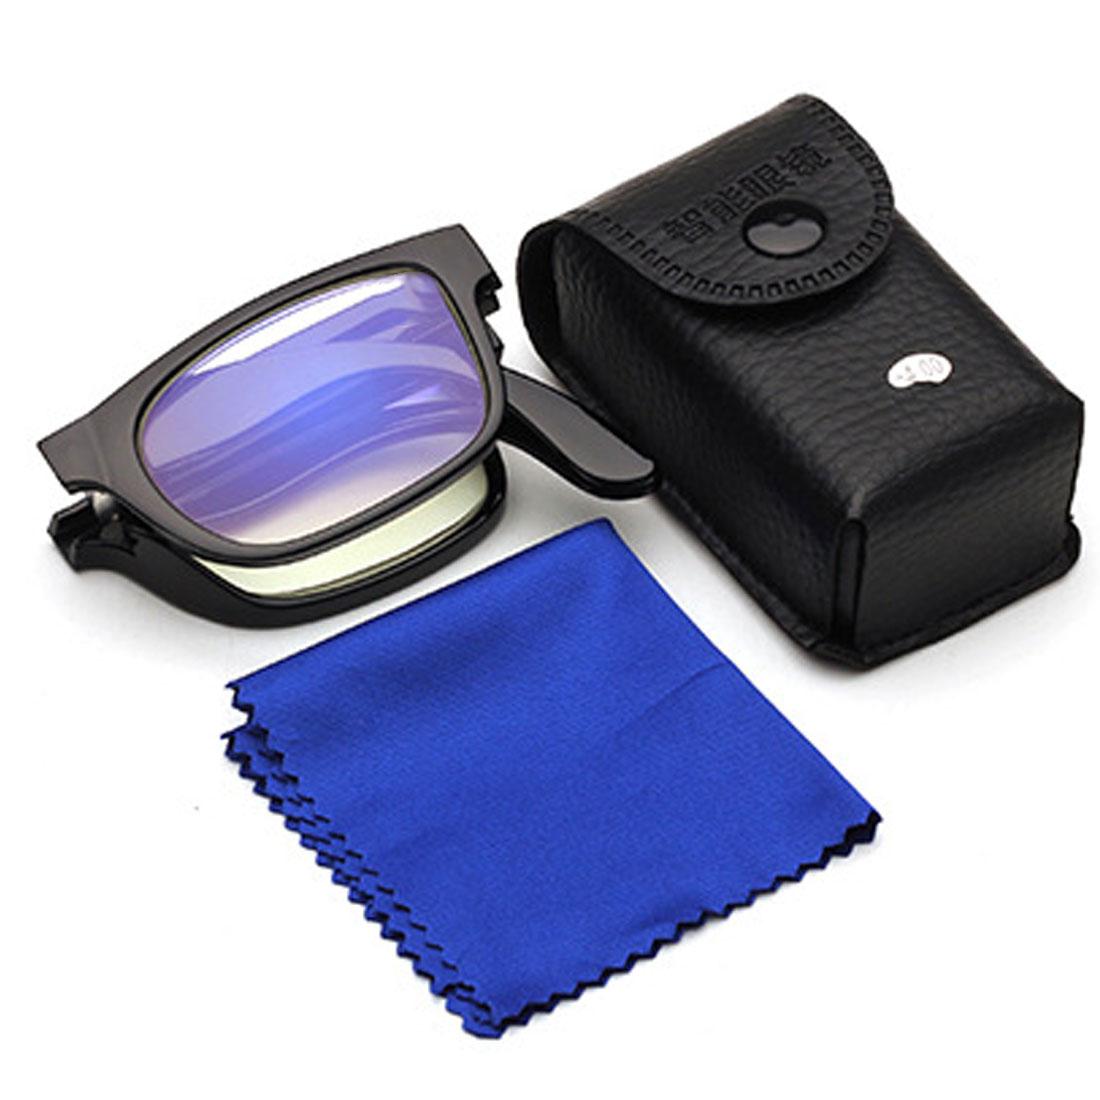 Unisex 100-400 Degree Rimless Magnetic Eyeglasses Fashion Reading Glasses With Box Ultralight Vision Care Folding Eyeglasses